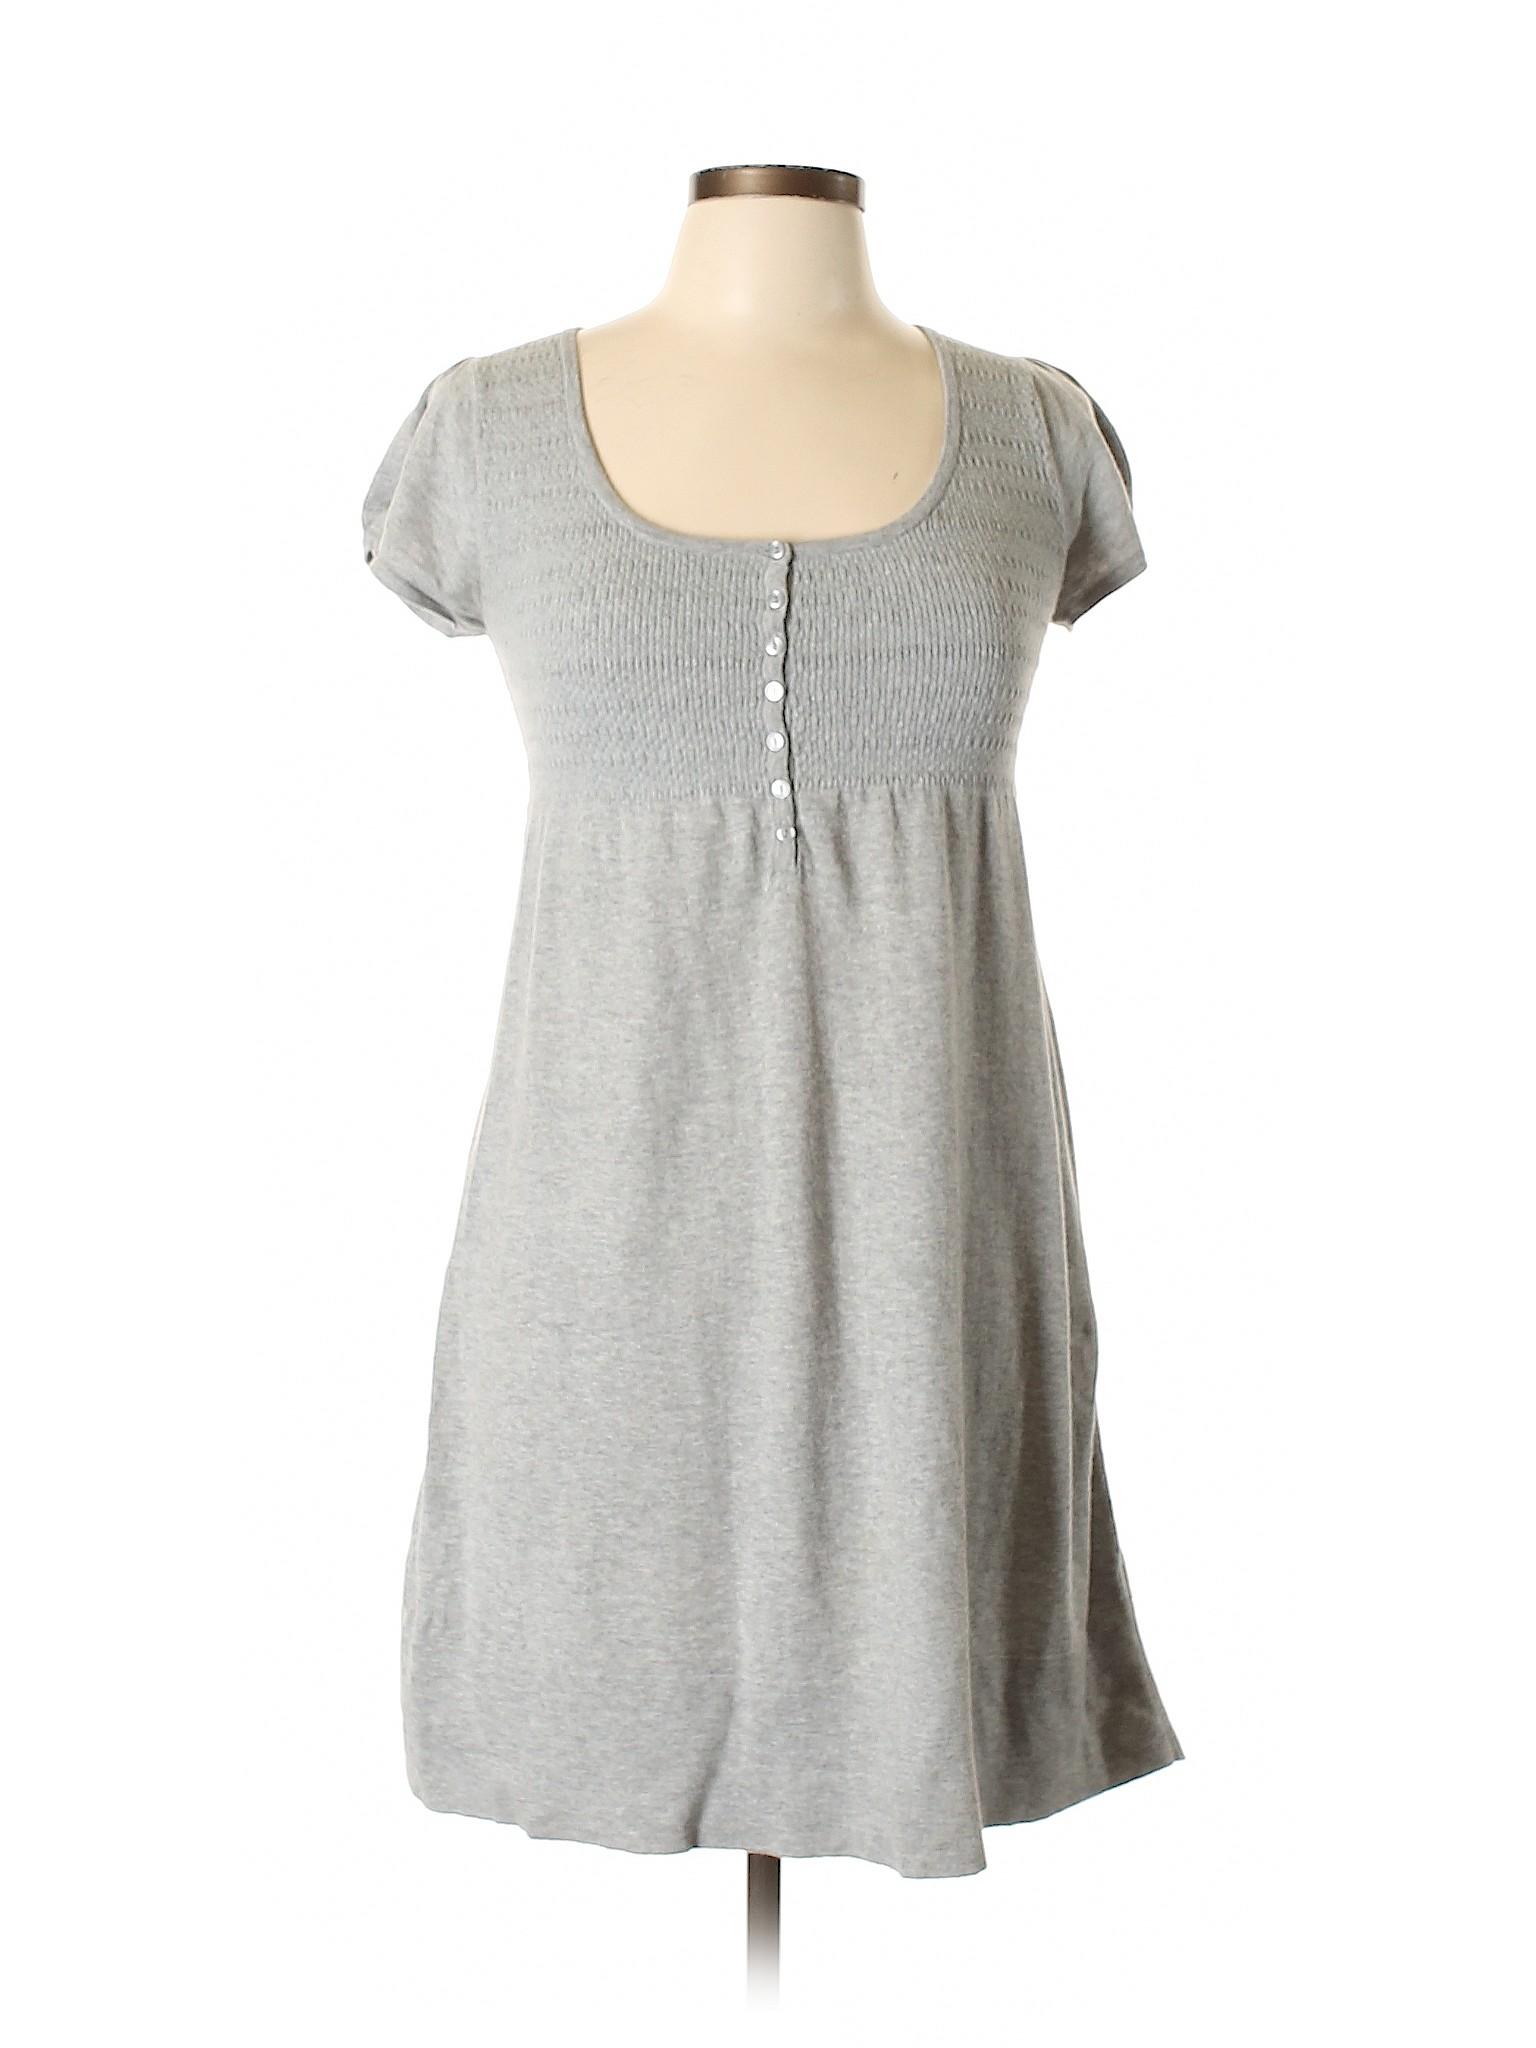 Selling Dress Selling Zara Casual Zara Dress Selling Casual Pr0xUwqr8T